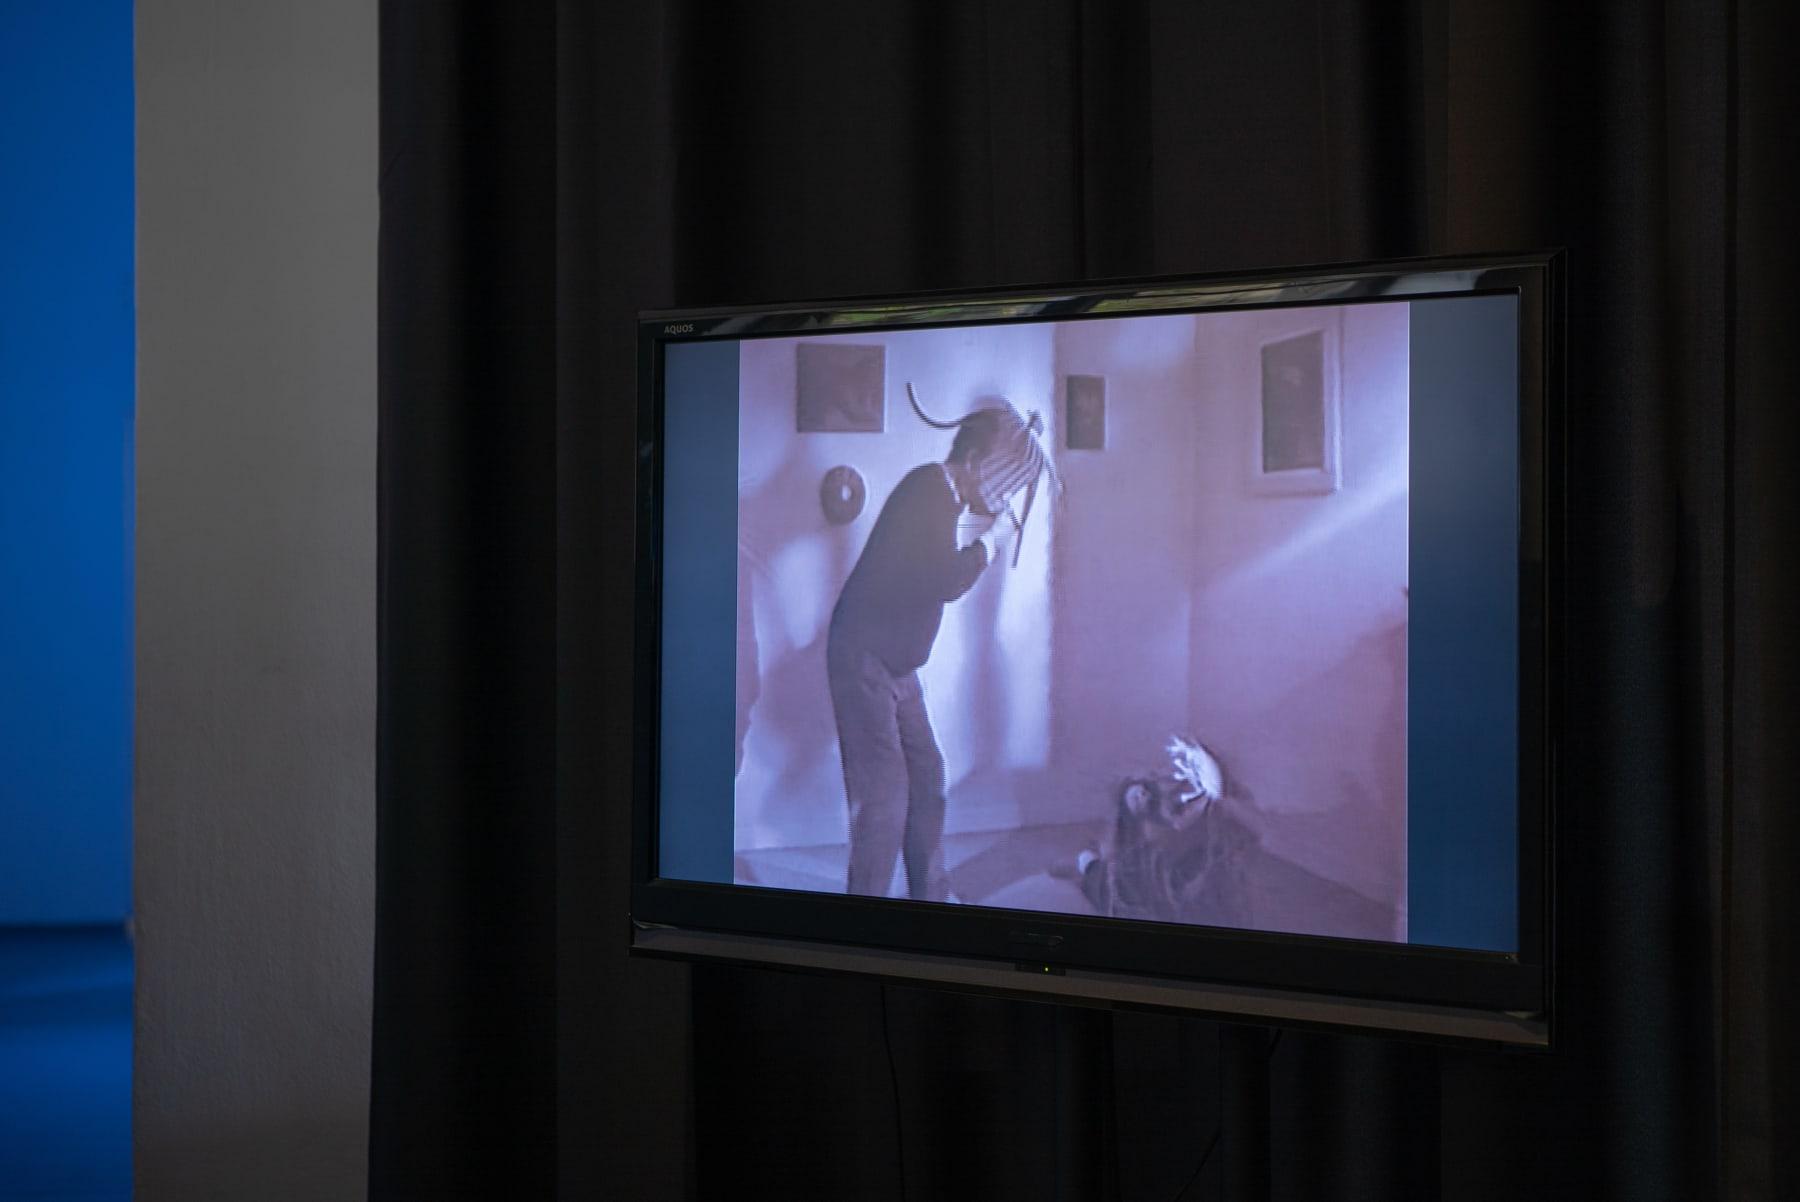 Mončys, Henrikas Gulbinas' film on the life and work of Antanas Montčys Installation view fotographed by Laurynas Skeisgiela